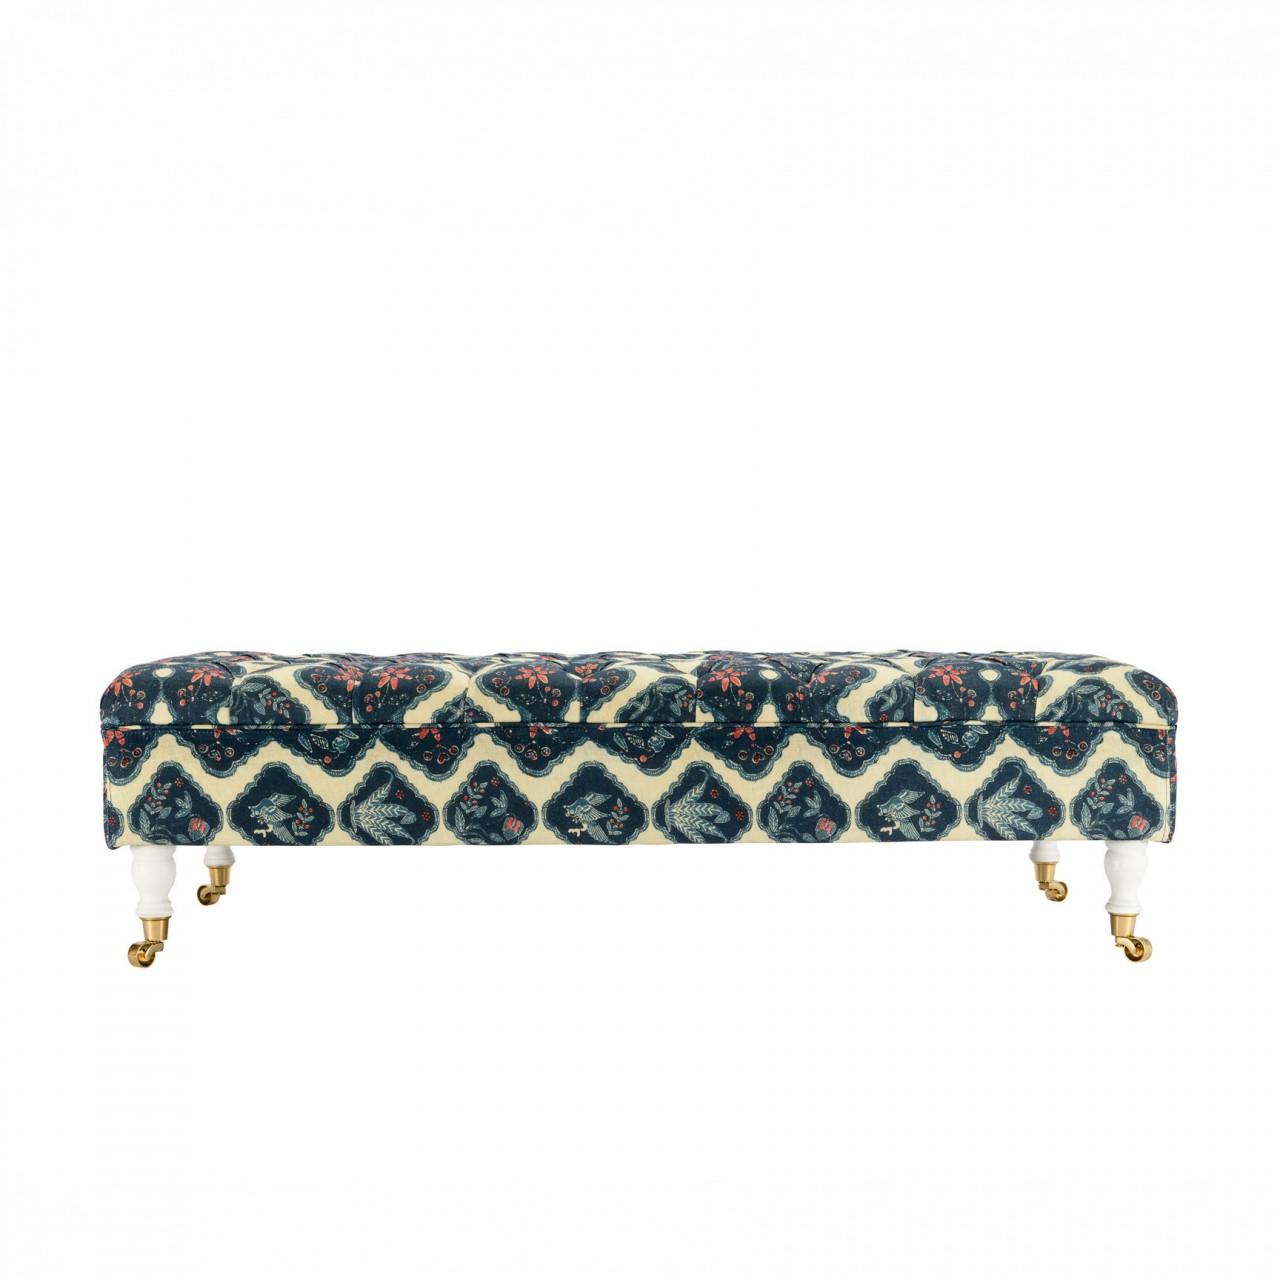 SARAY Ottoman - PHOENICIA BATIK Fabric